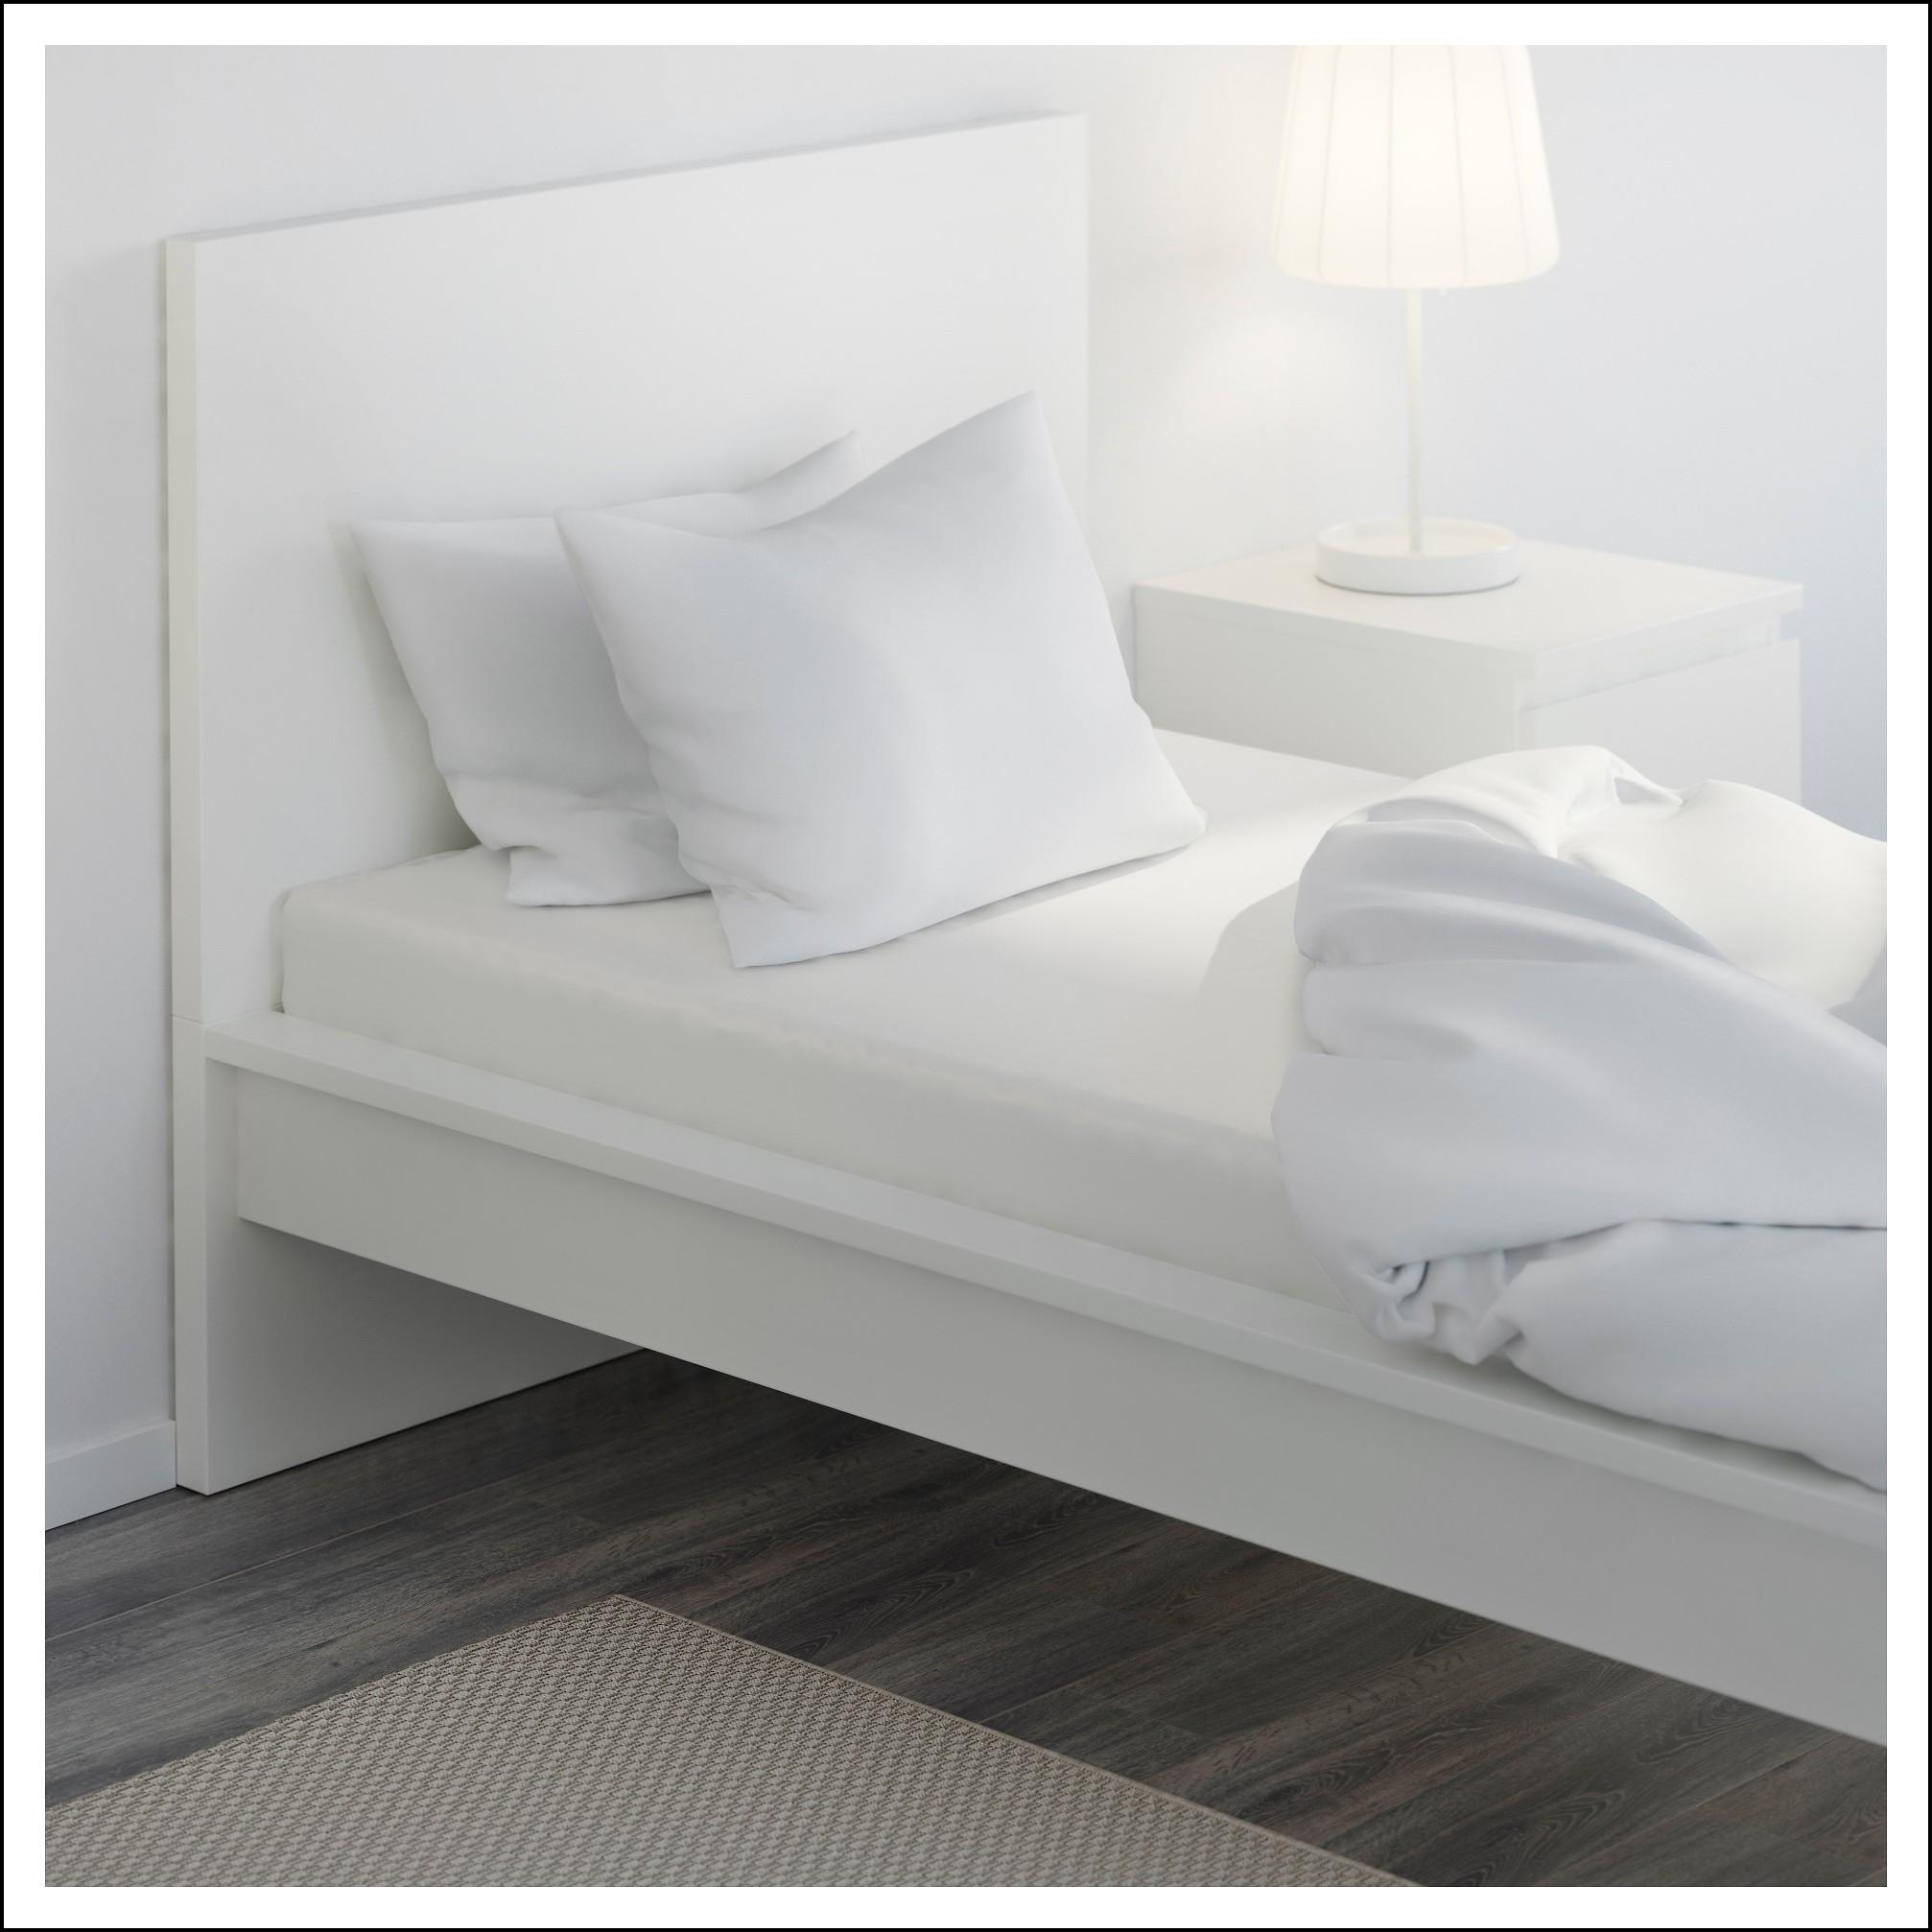 wei bettlaken ikea betten house und dekor galerie jvr7nab1zj. Black Bedroom Furniture Sets. Home Design Ideas